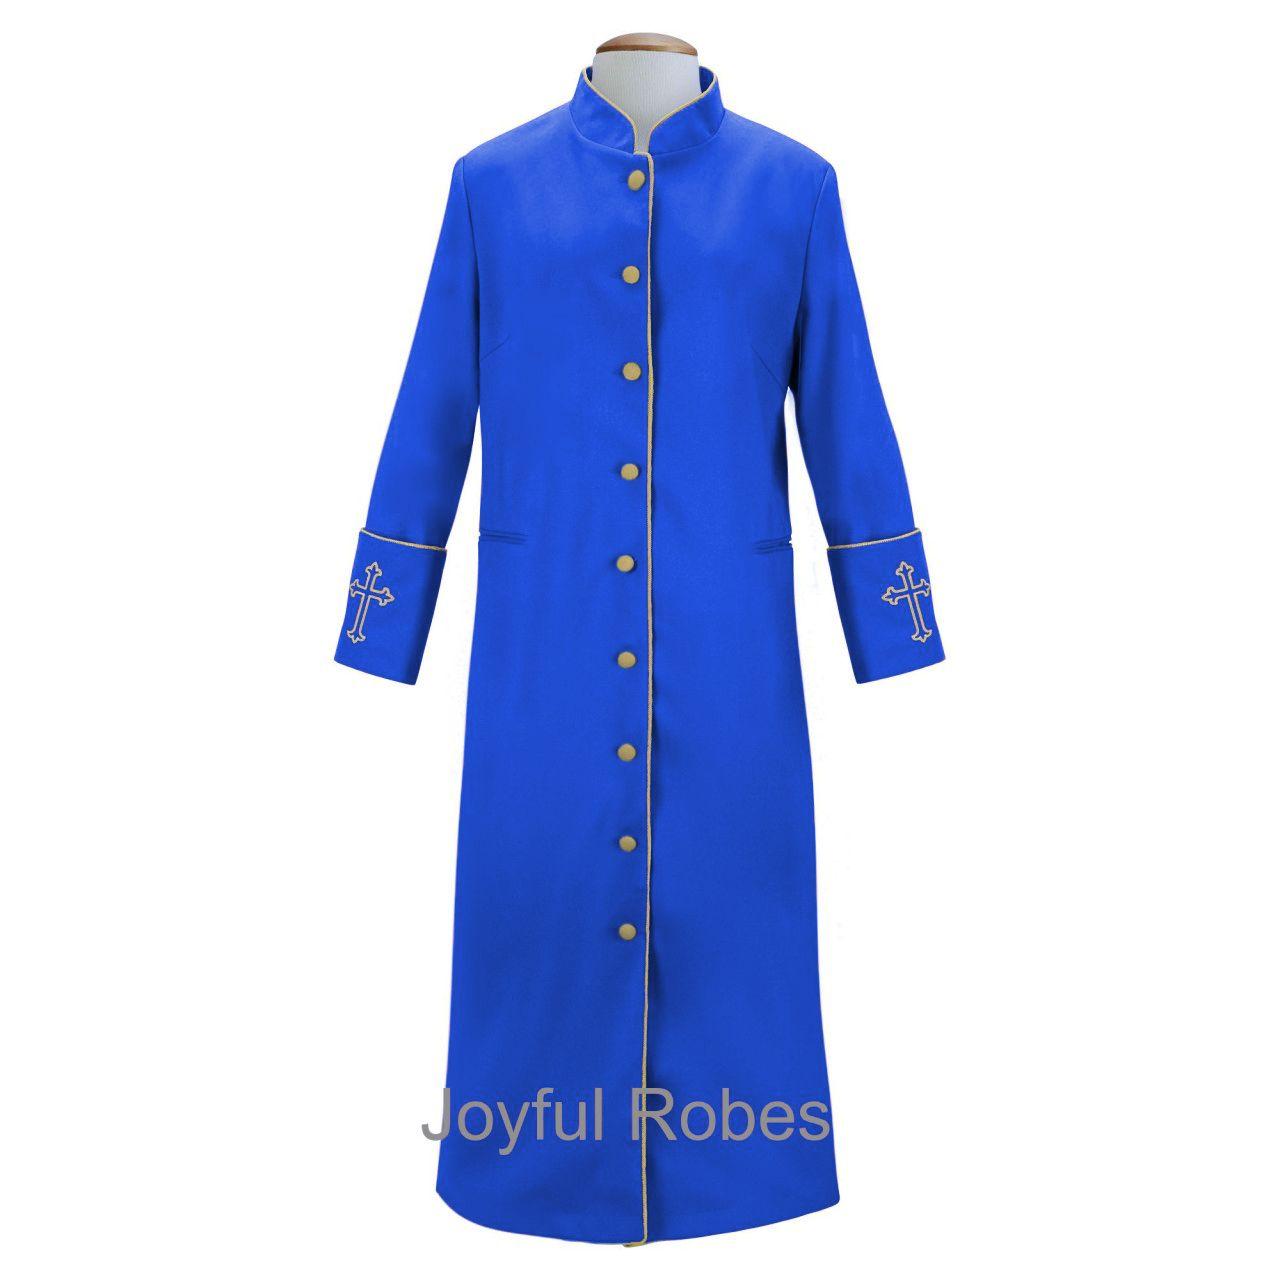 208 W. Women's Clergy/Pastor Robe Royal/Gold Design